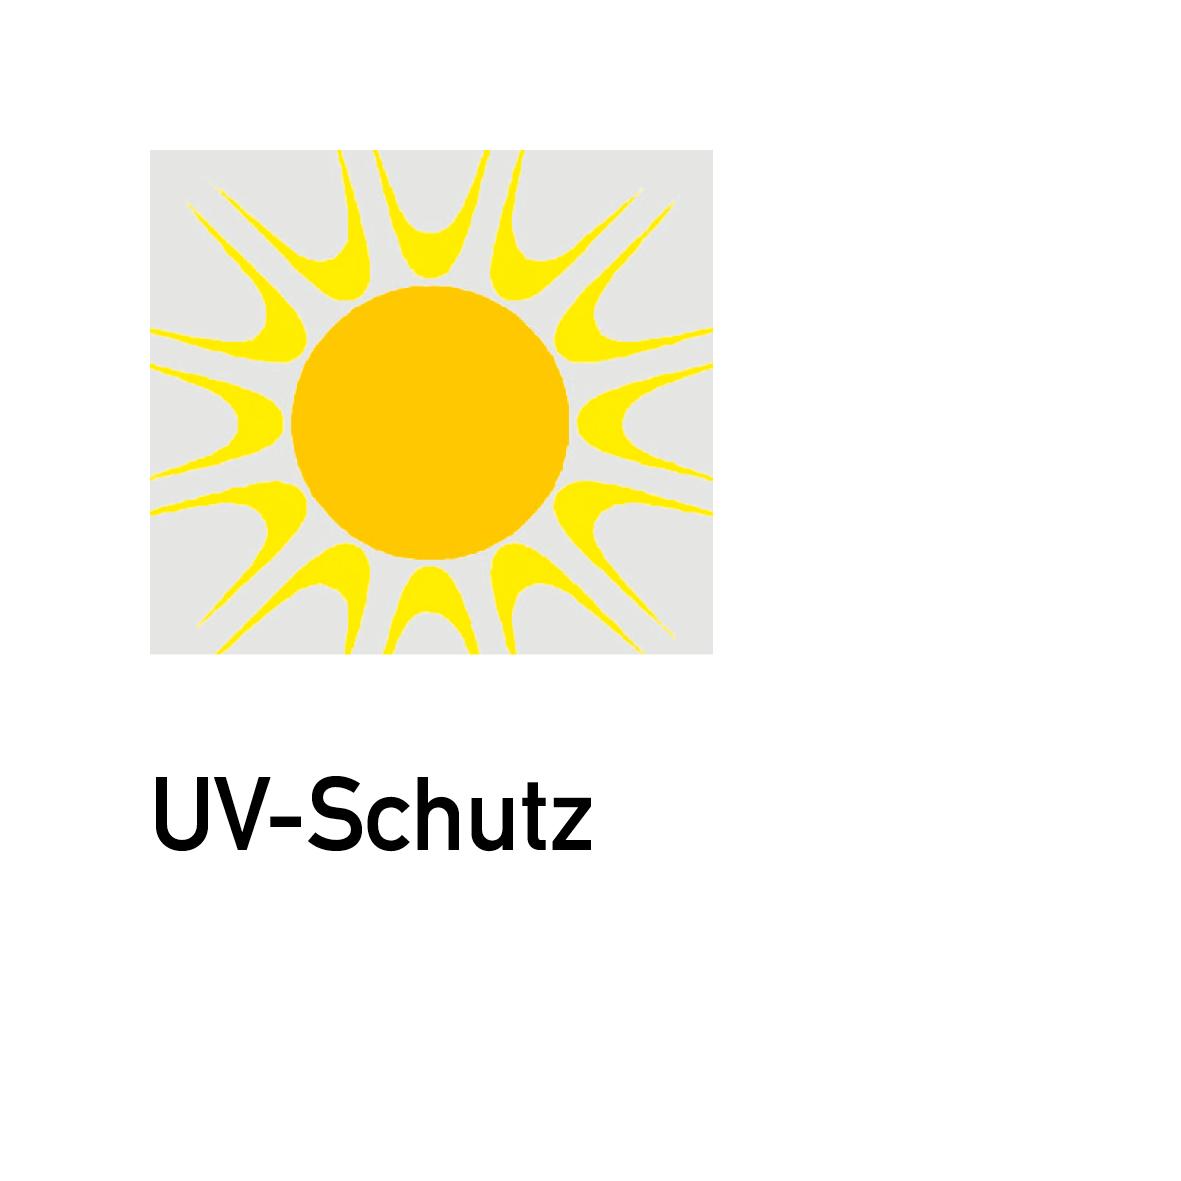 UV_Schutz